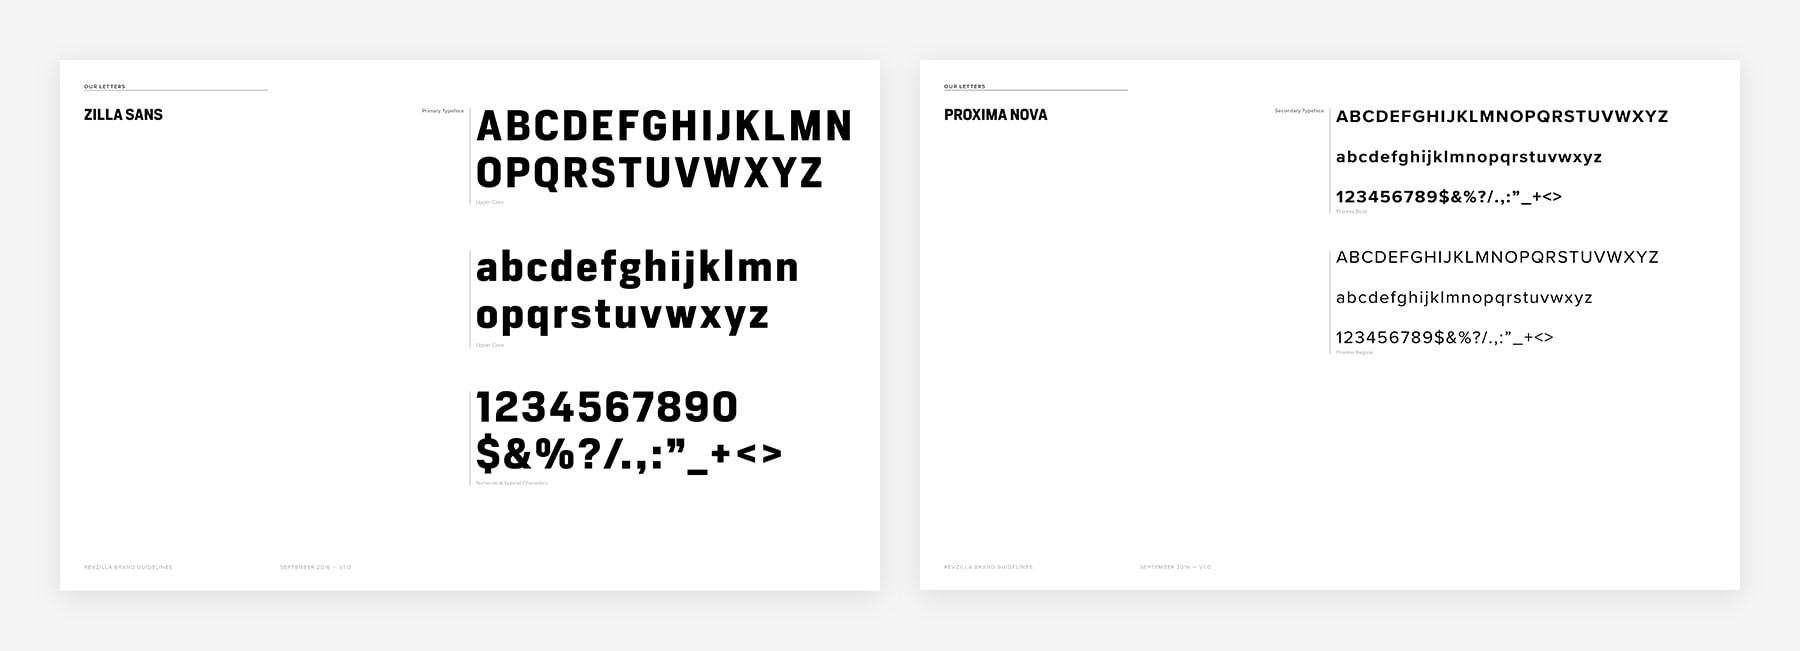 04 RevZilla Brand Guide.jpg